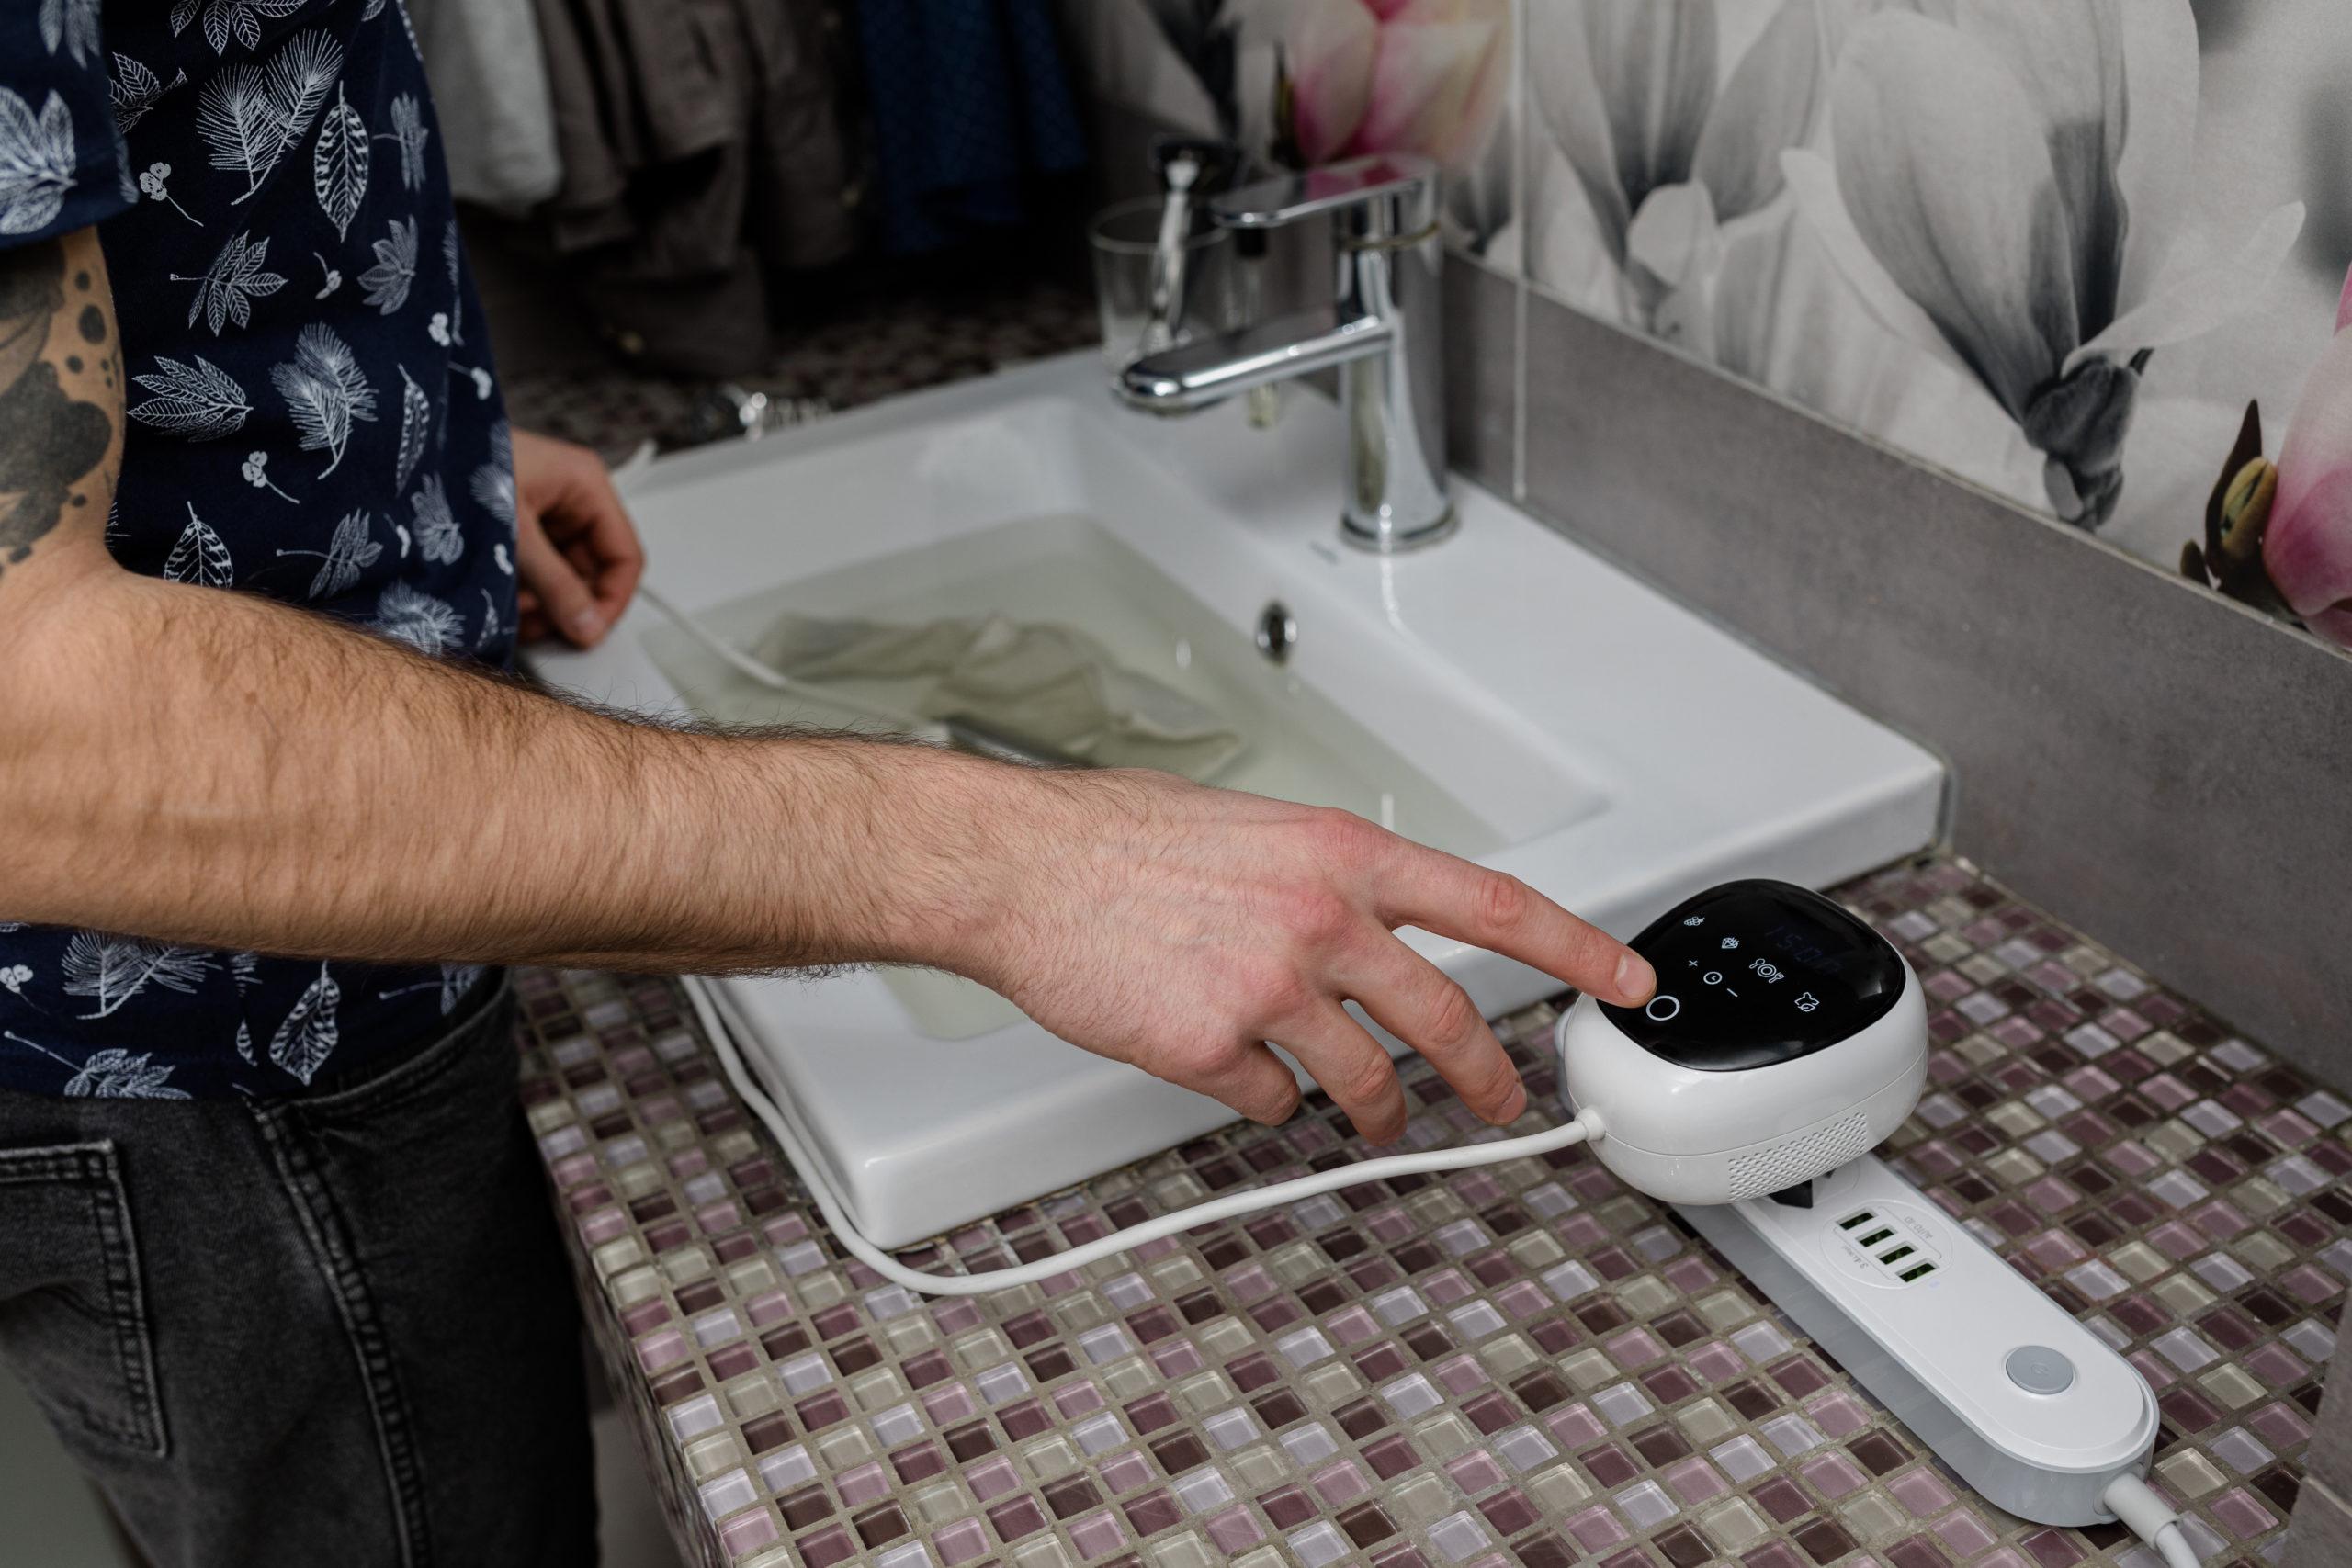 Ultrasona near a sink